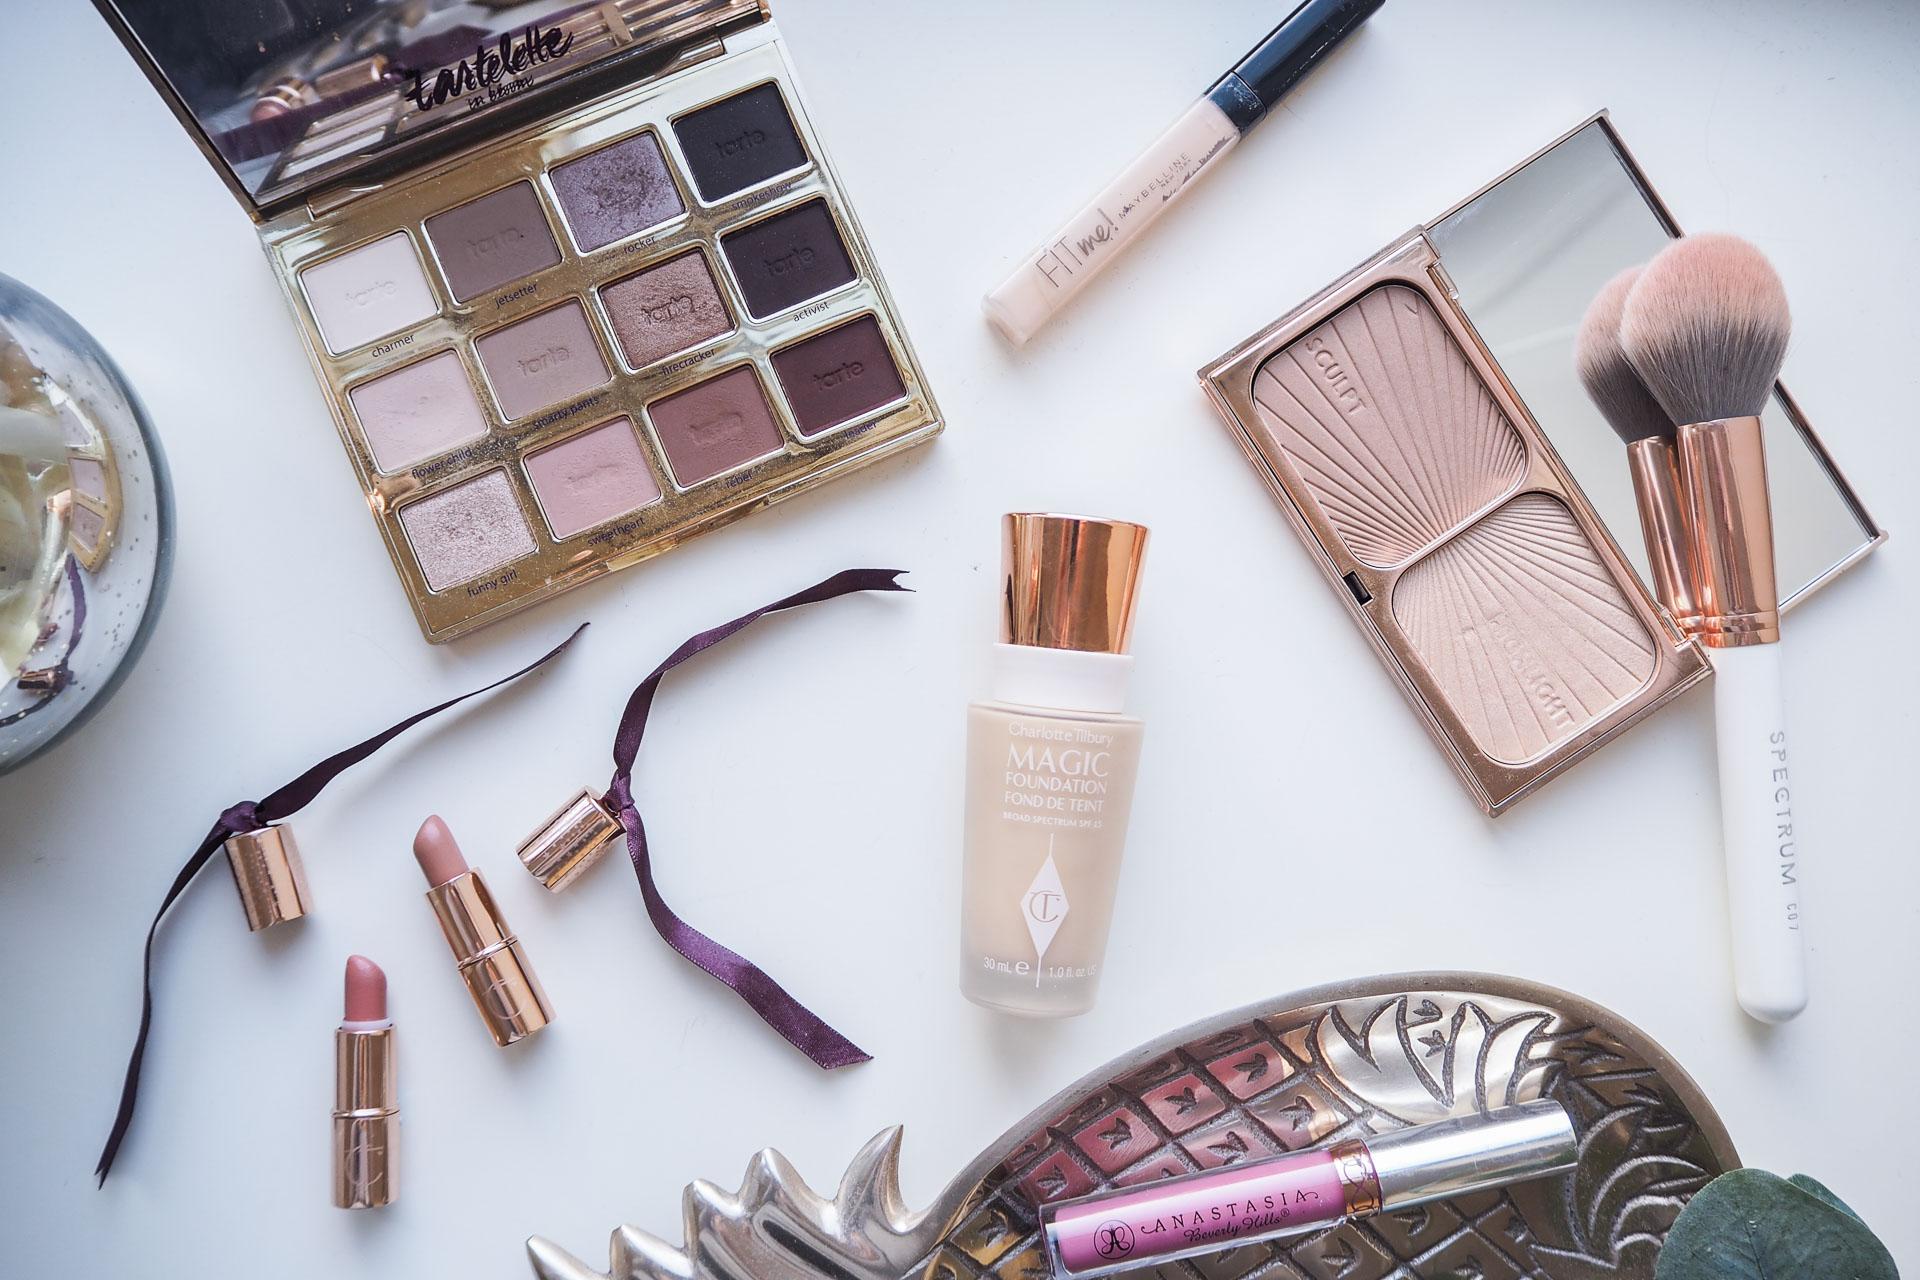 makeup favourites 2017. charlotte tilbury, tarte, anatasia, maybelline